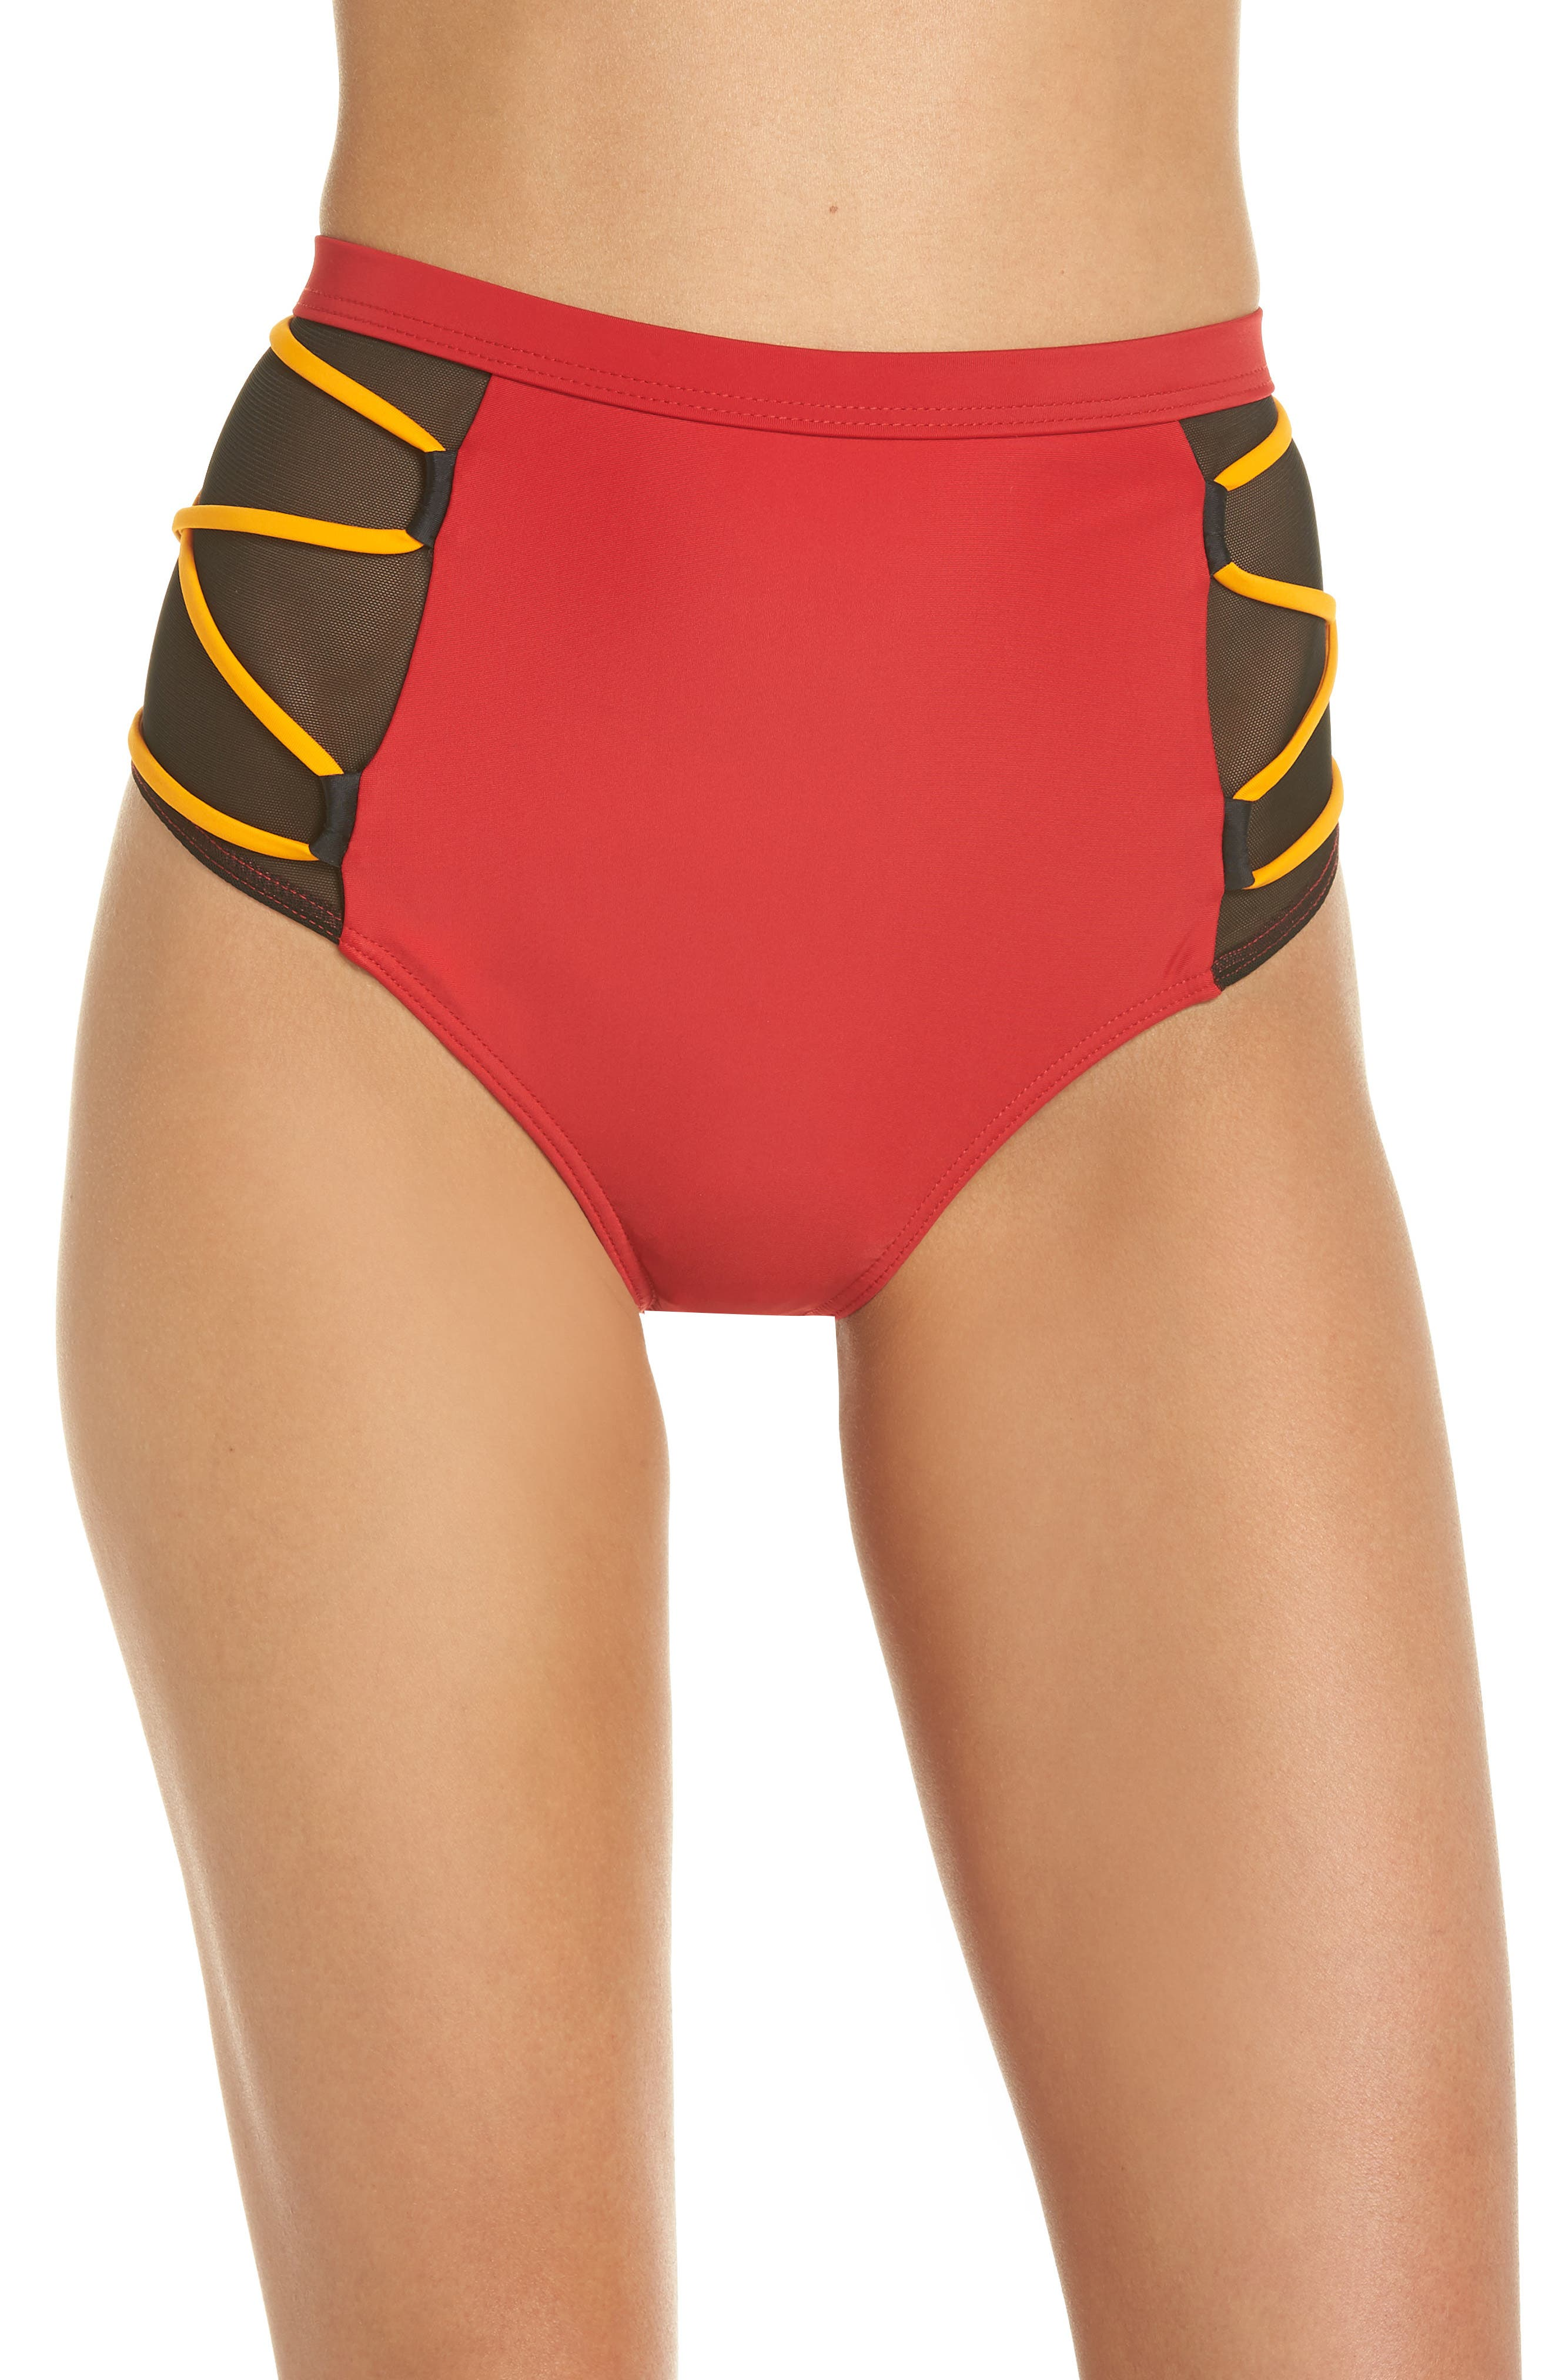 Chromat Launch Bikini Bottoms